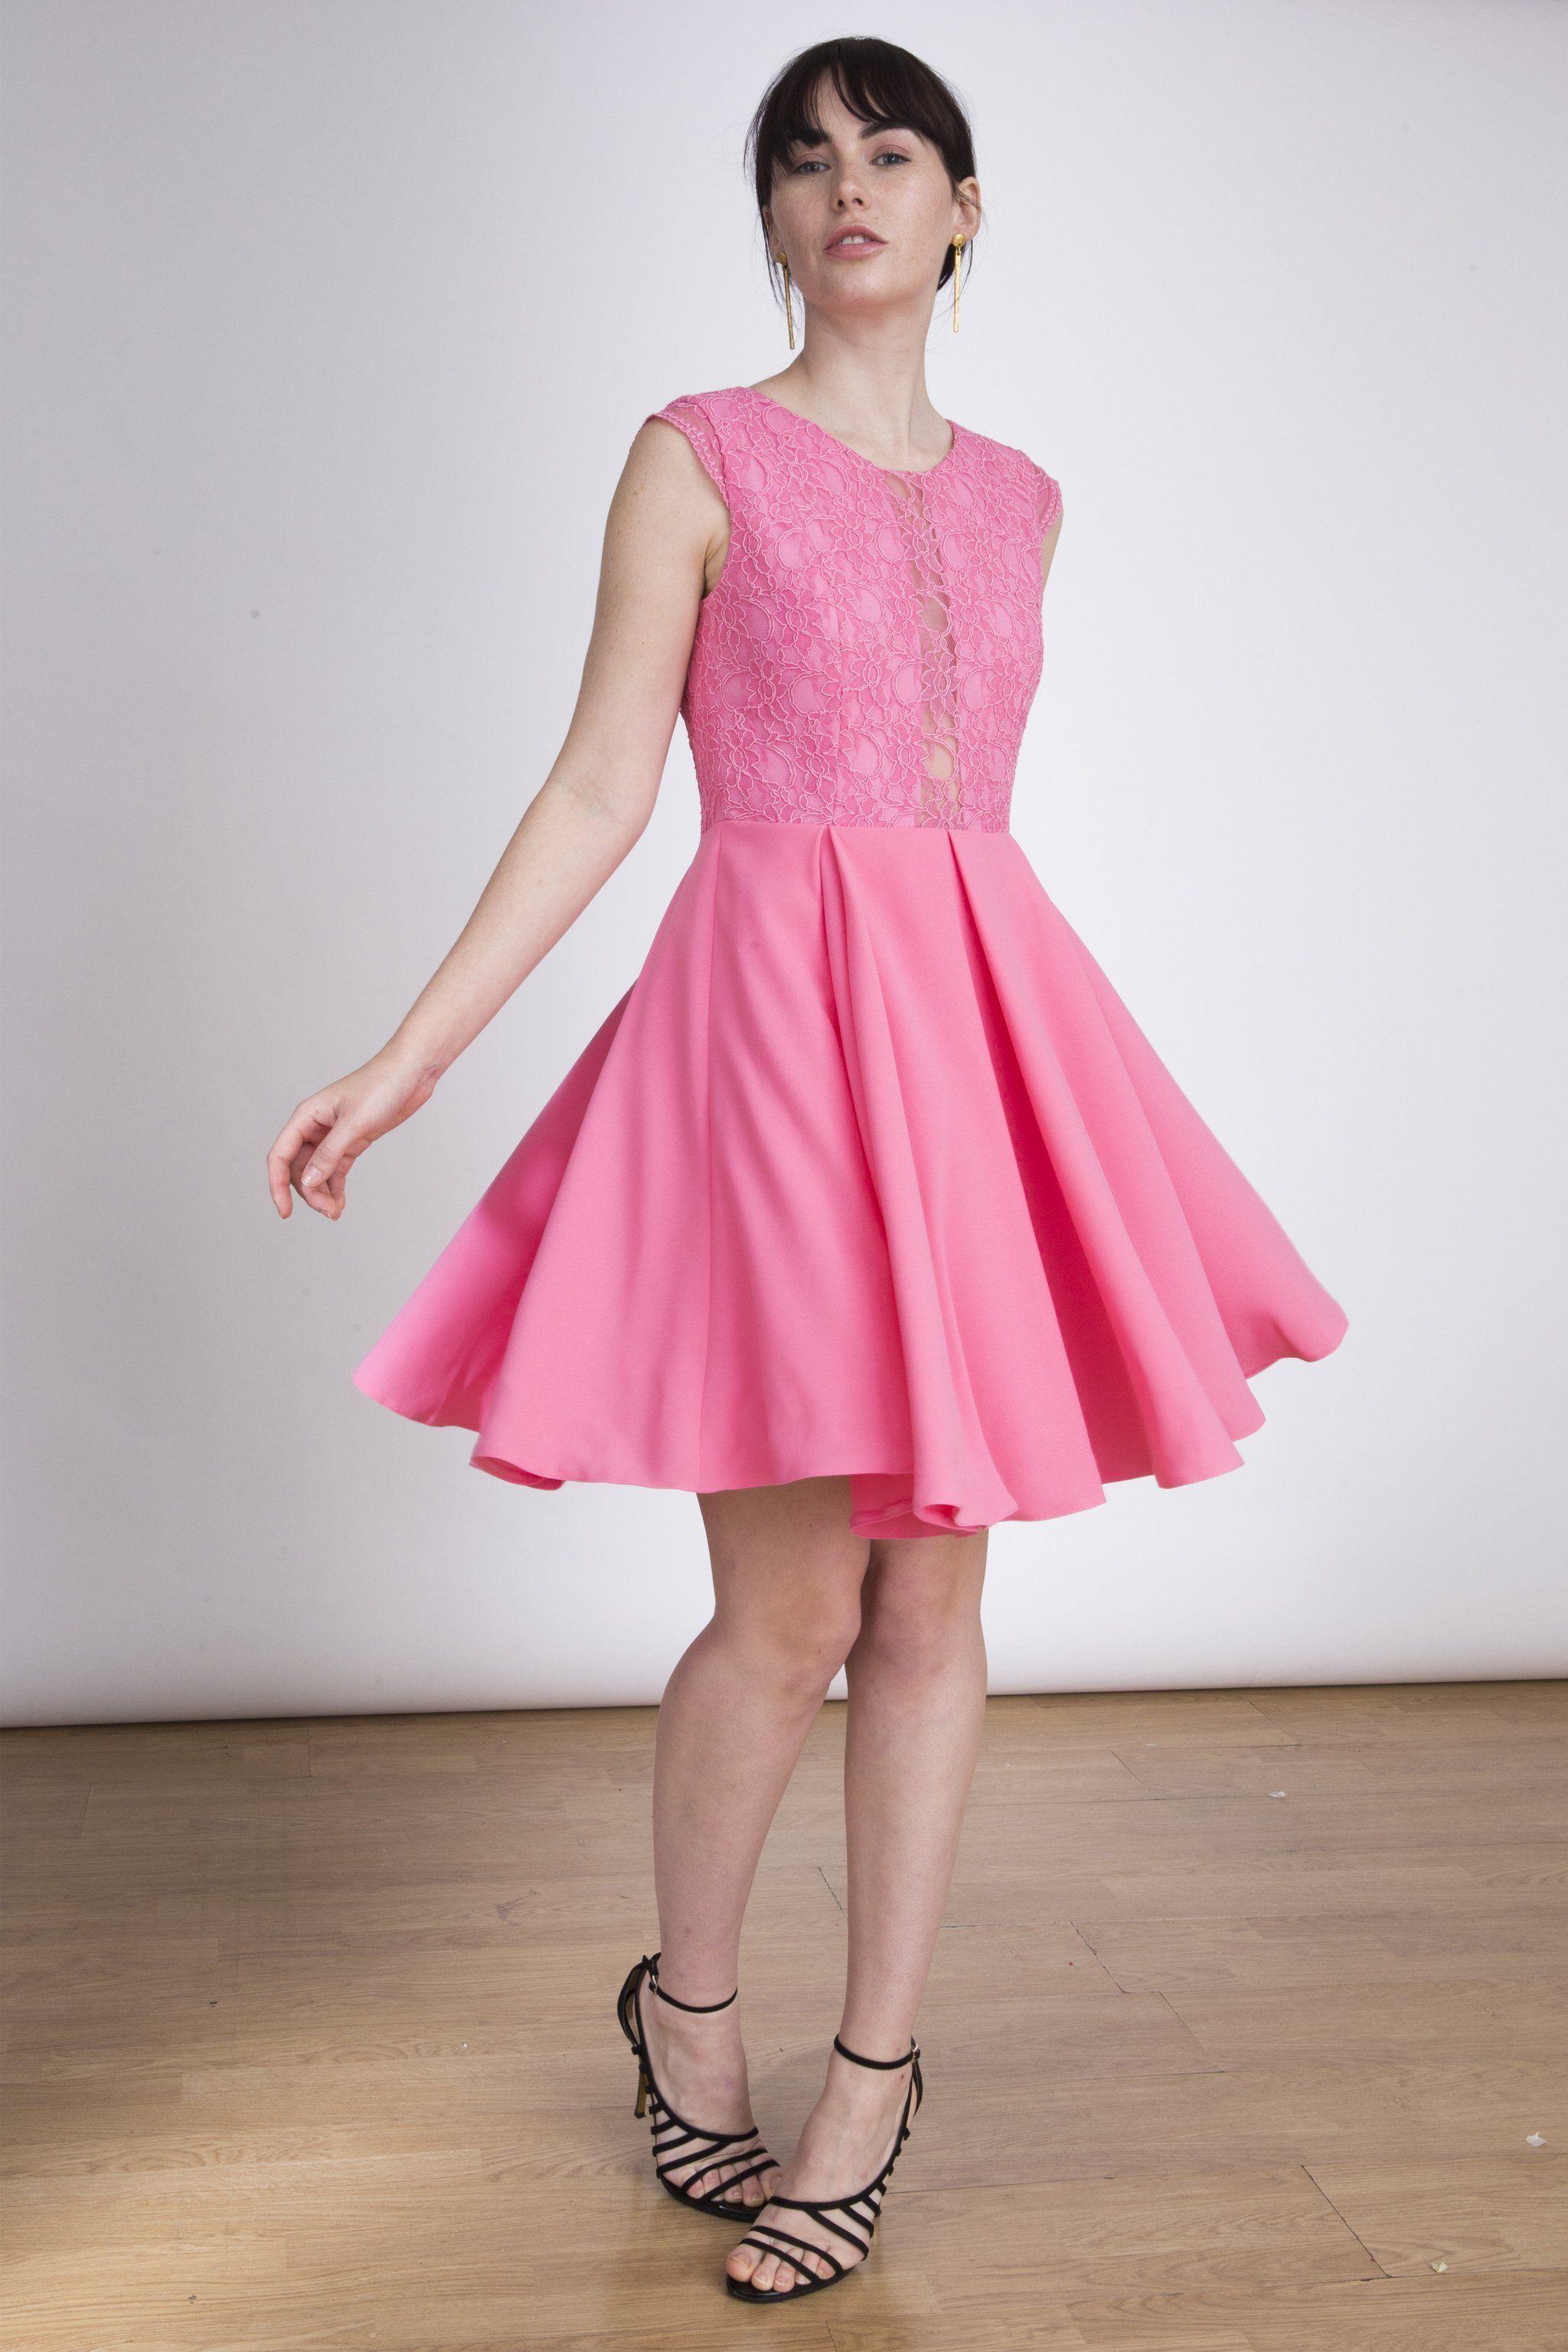 The Christy Mini Dress - Lace Millennial pink dress | Dresses ...